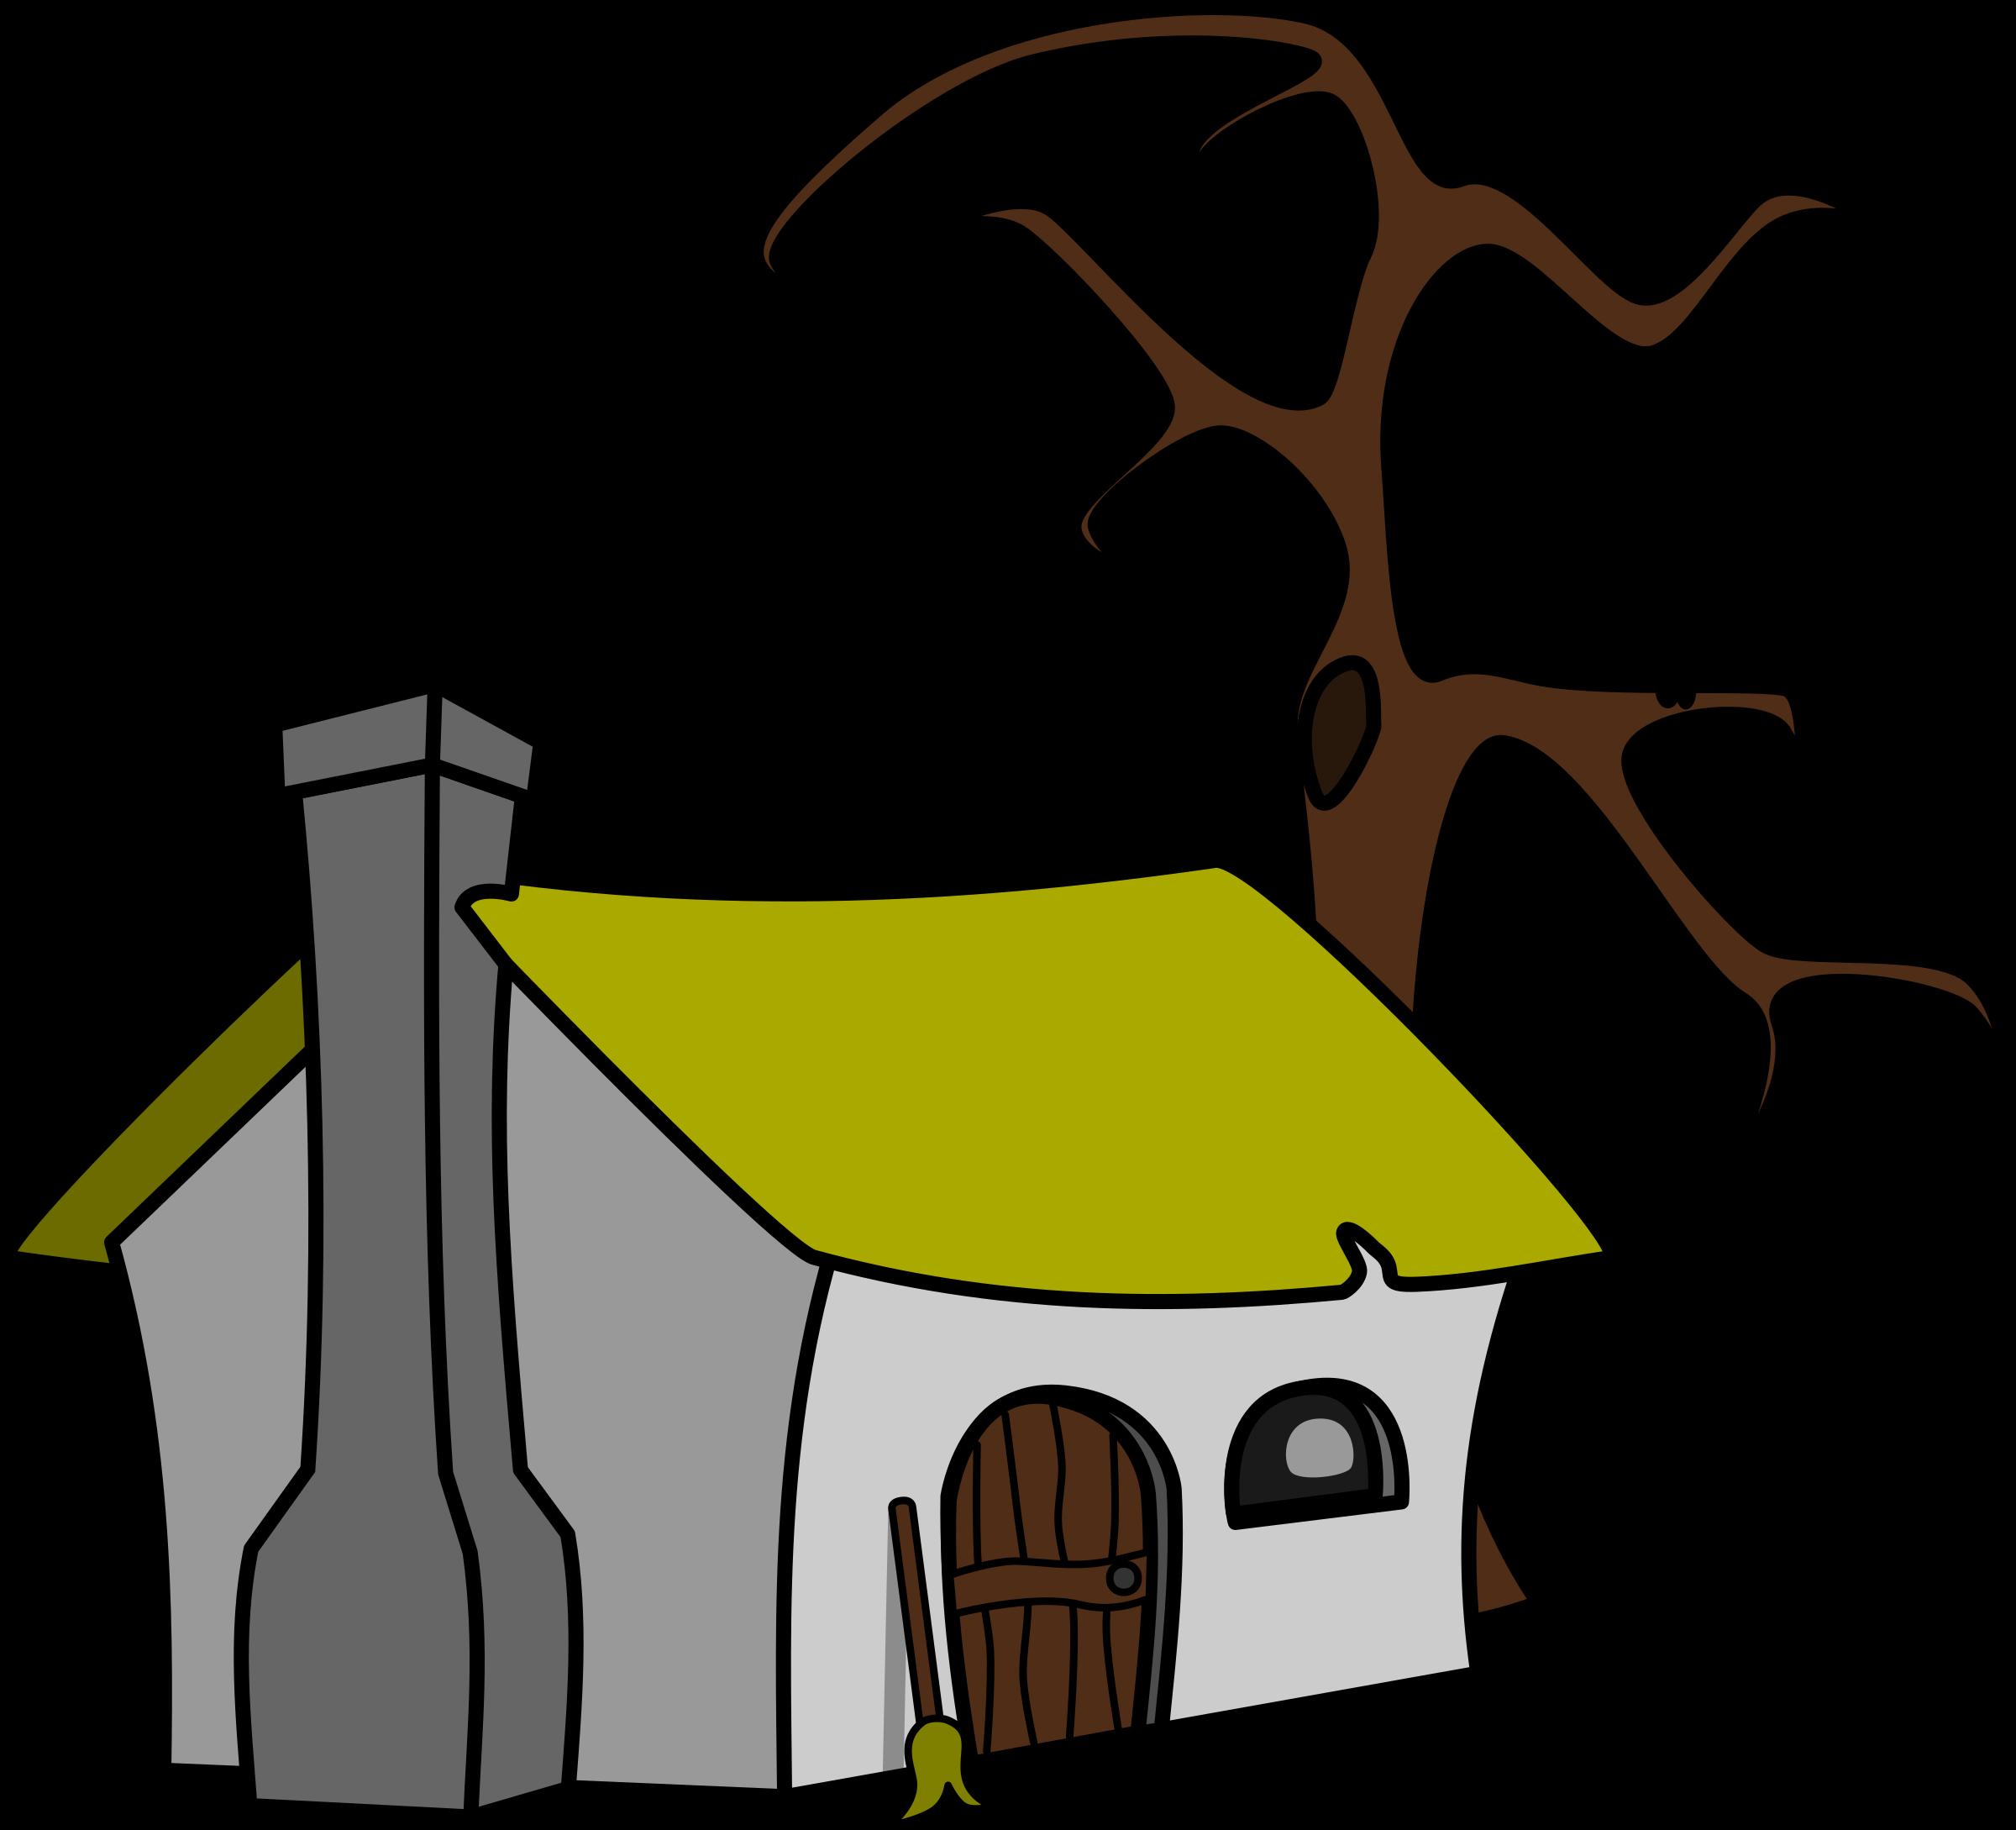 Cottage clipart fairytale cottage. Witch s big image